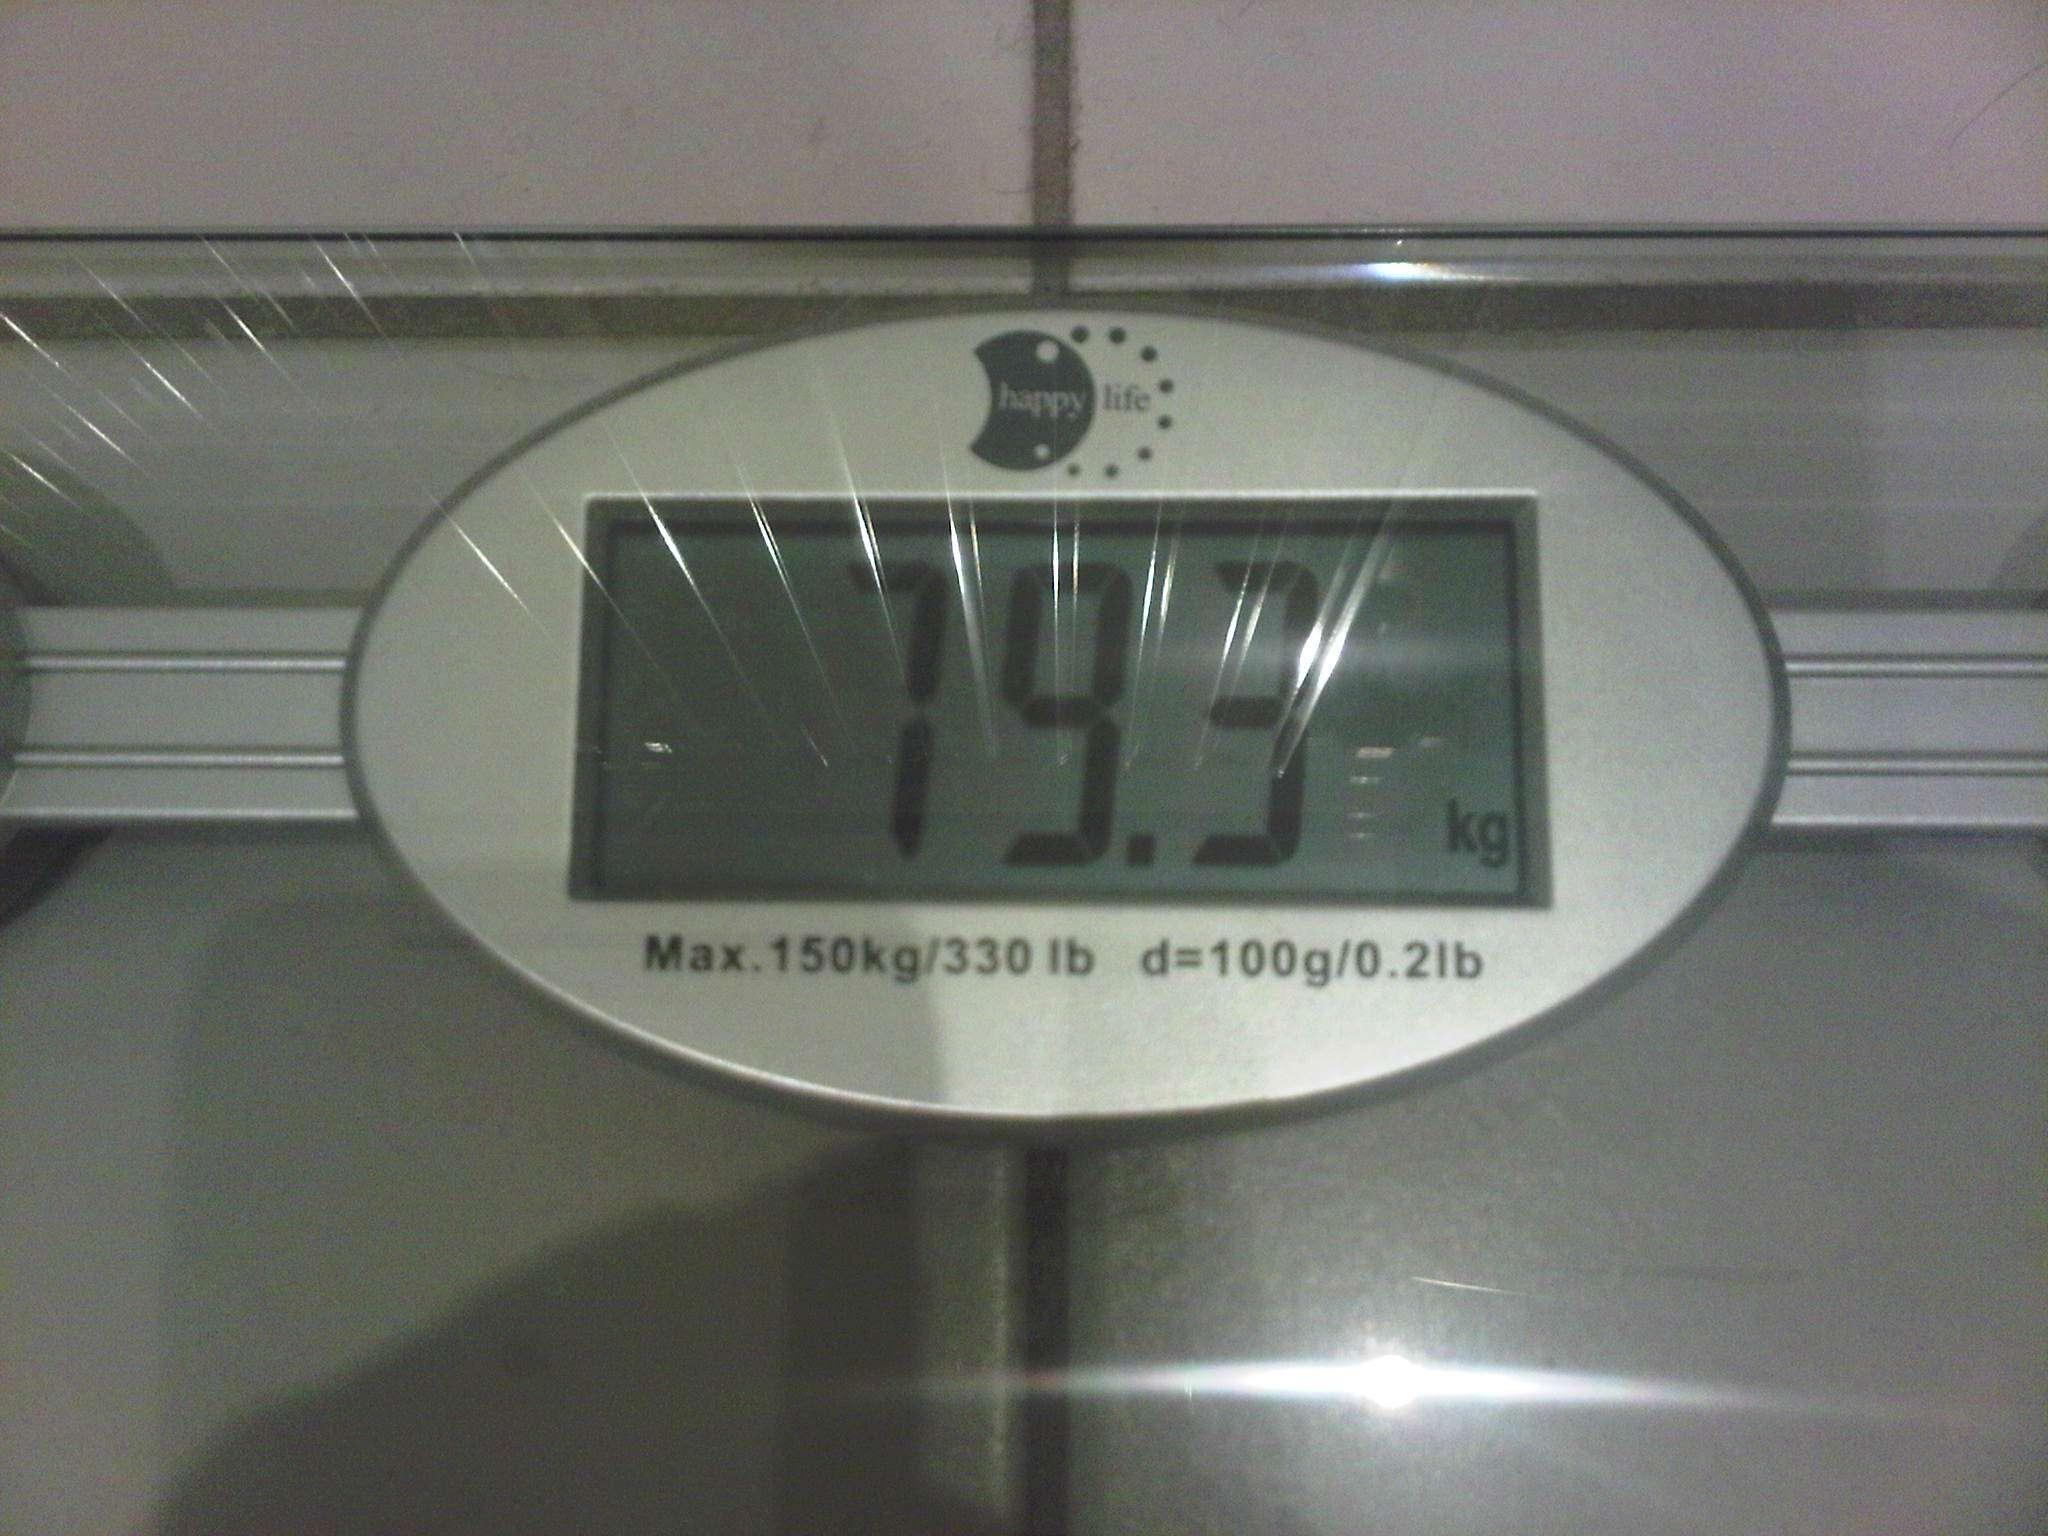 Manje od 80 kg nakon puno vremena, konkretno 79,3 kg